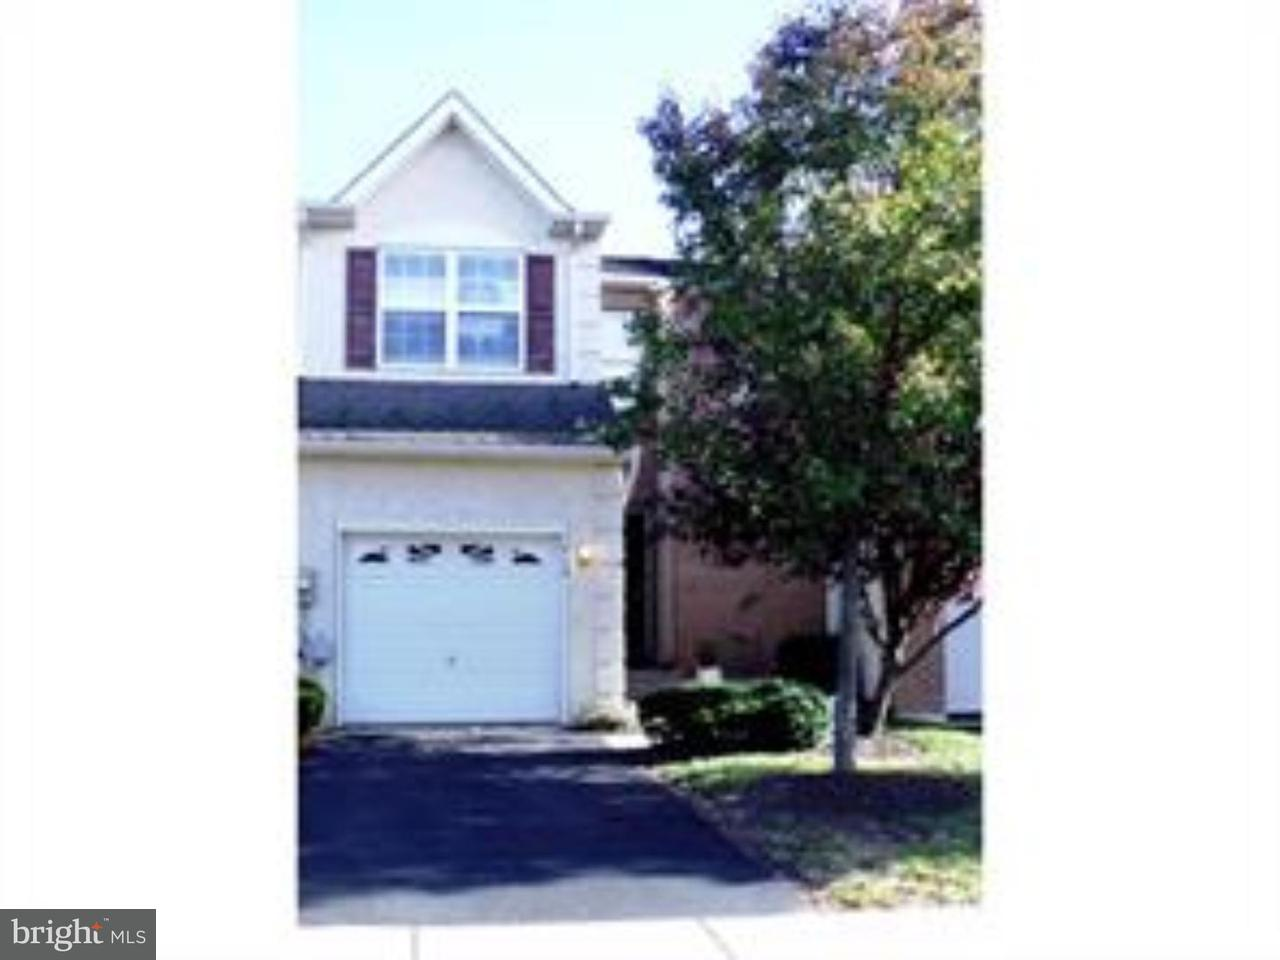 Casa unifamiliar adosada (Townhouse) por un Alquiler en 912 VANGUARD Drive Red Hill, Pennsylvania 18076 Estados Unidos